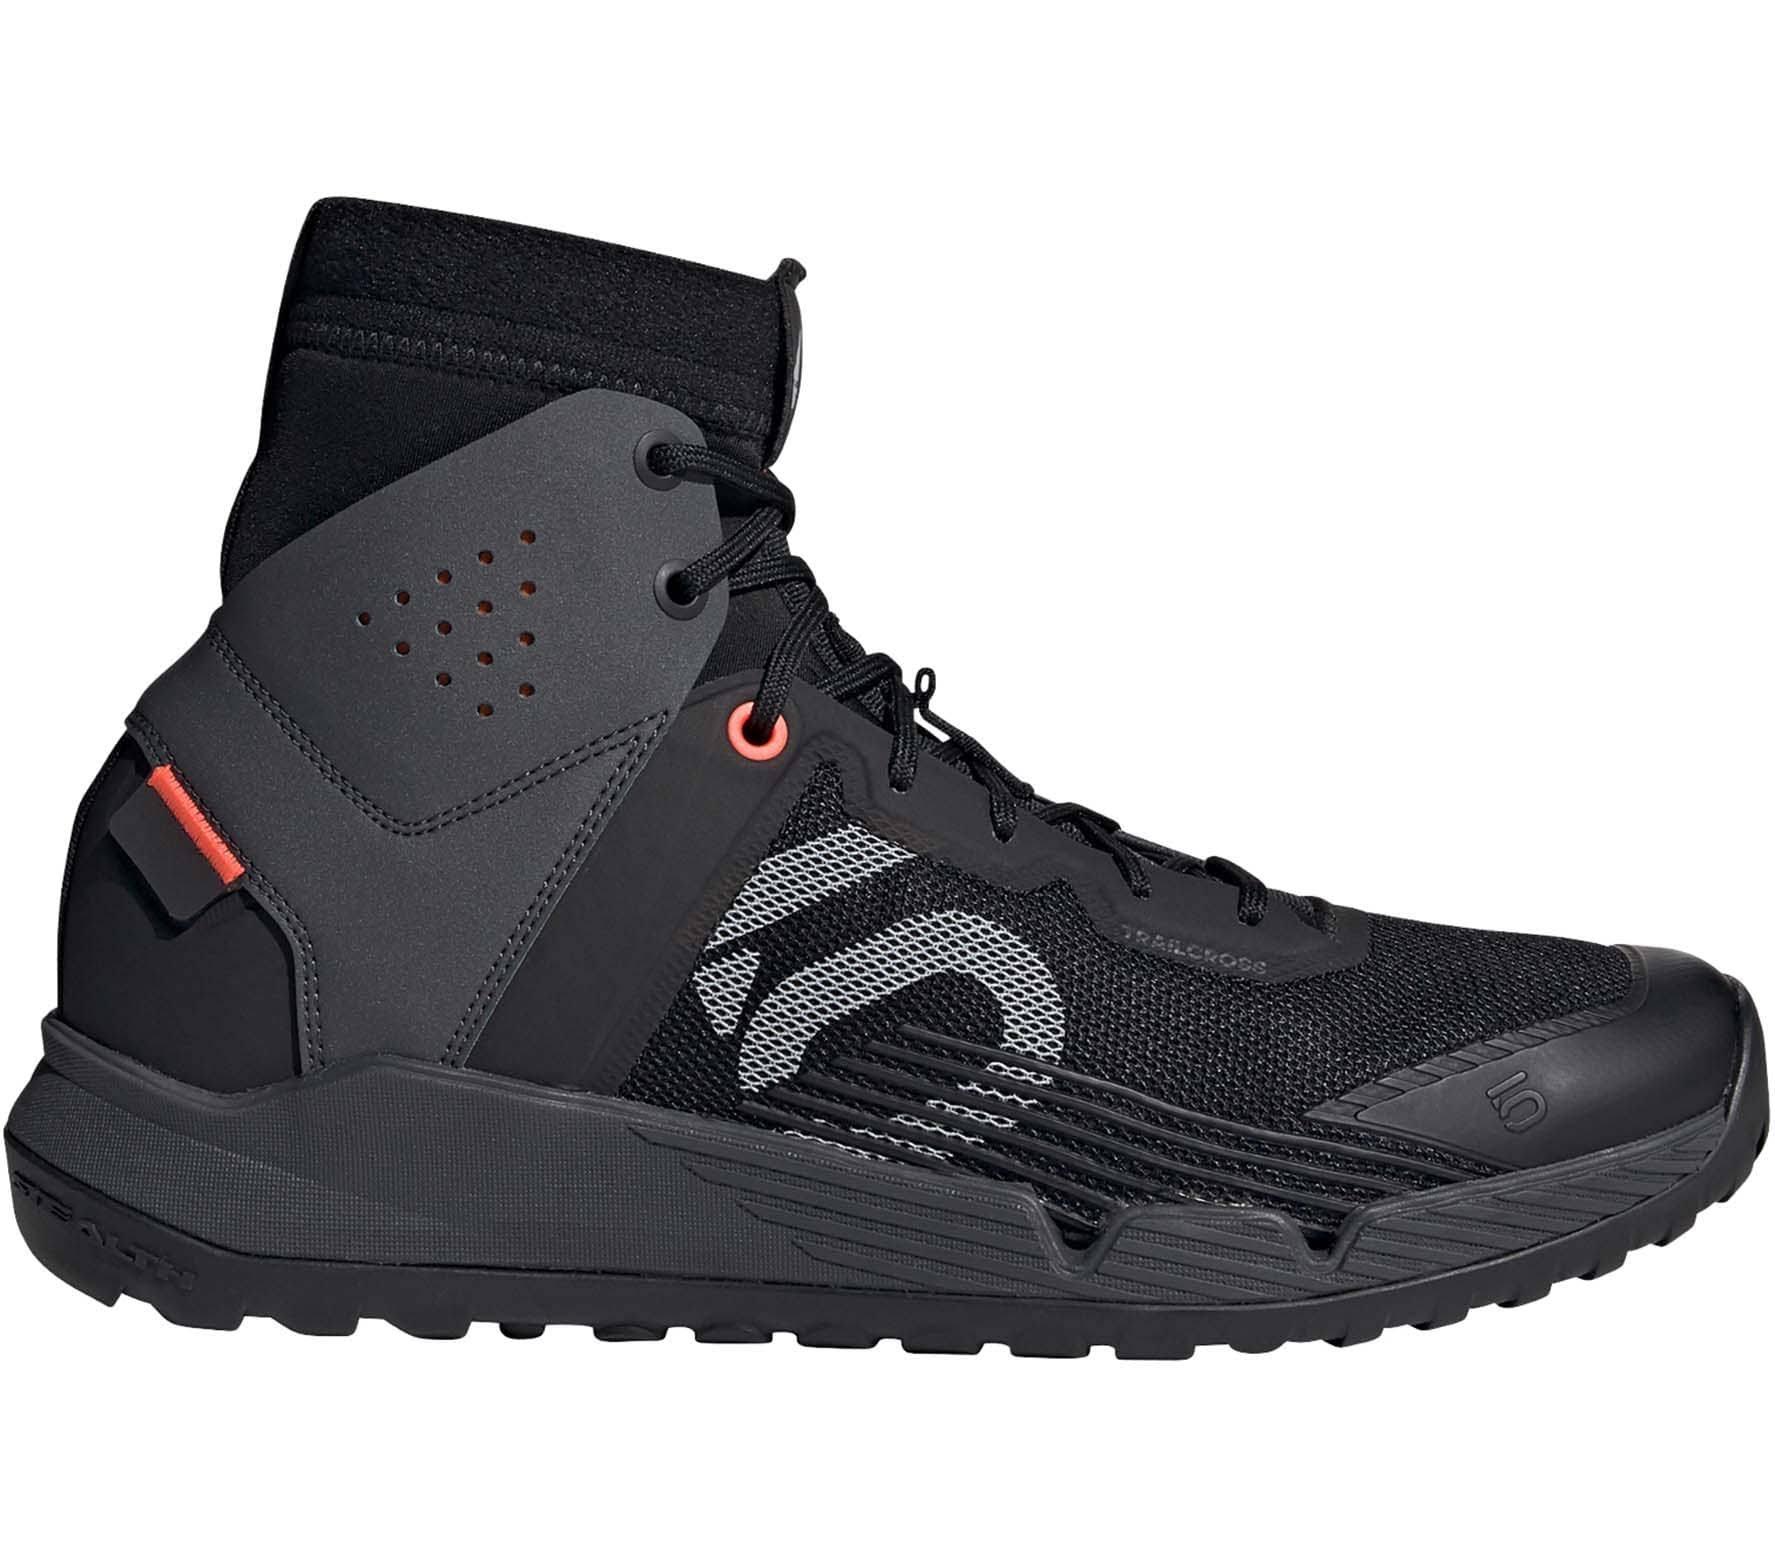 Five Ten Trailcross Mid Pro - MTB Shoes